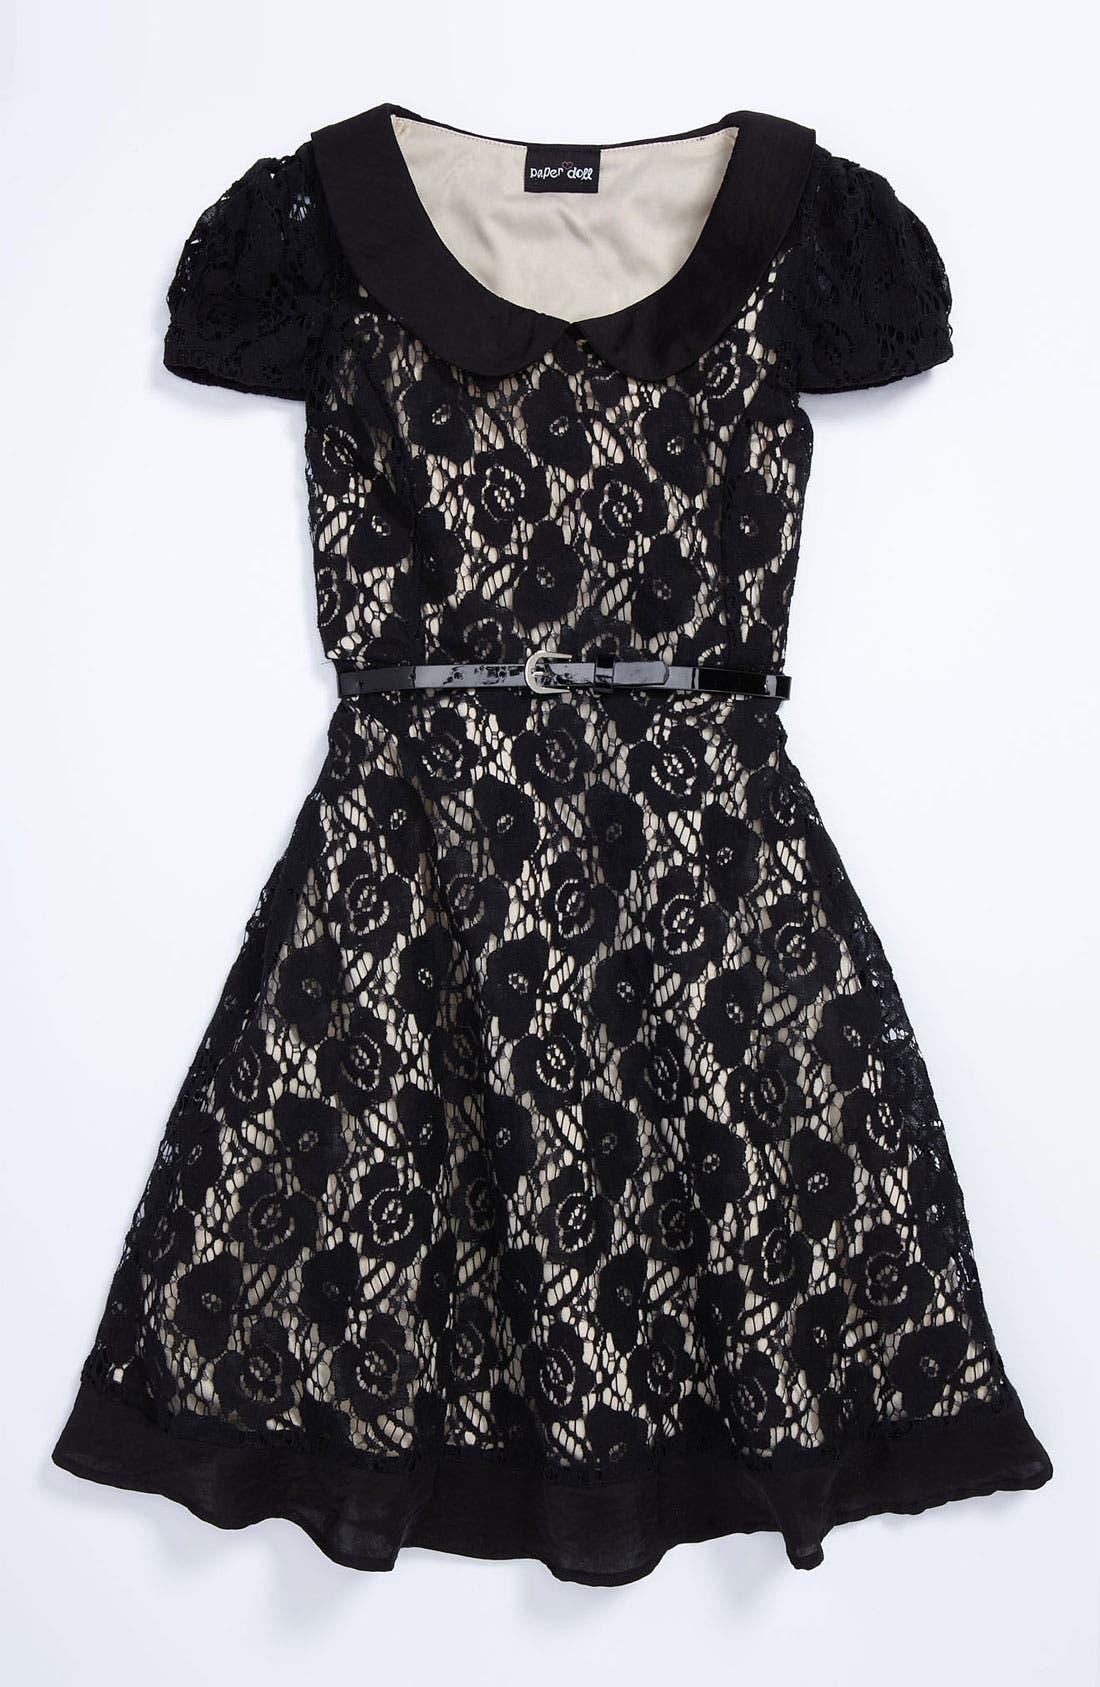 Main Image - Paper Doll Lace Dress (Little Girls & Big Girls)